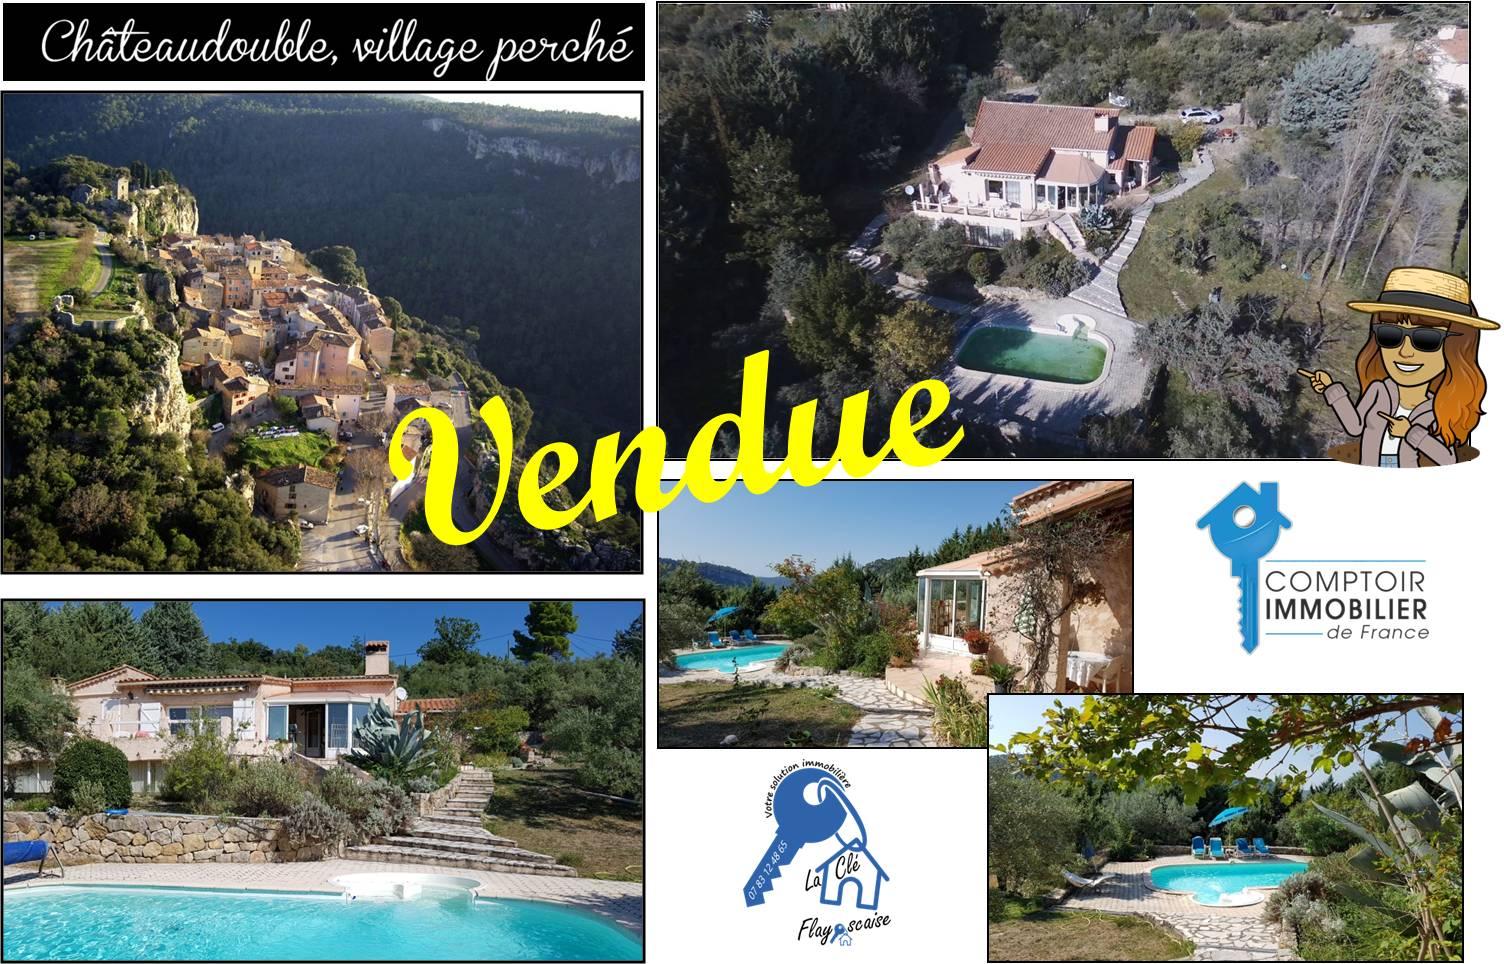 Chateaudouble - 300 000 € - 130 m² - 3 chambres - Terrain 4200 m²